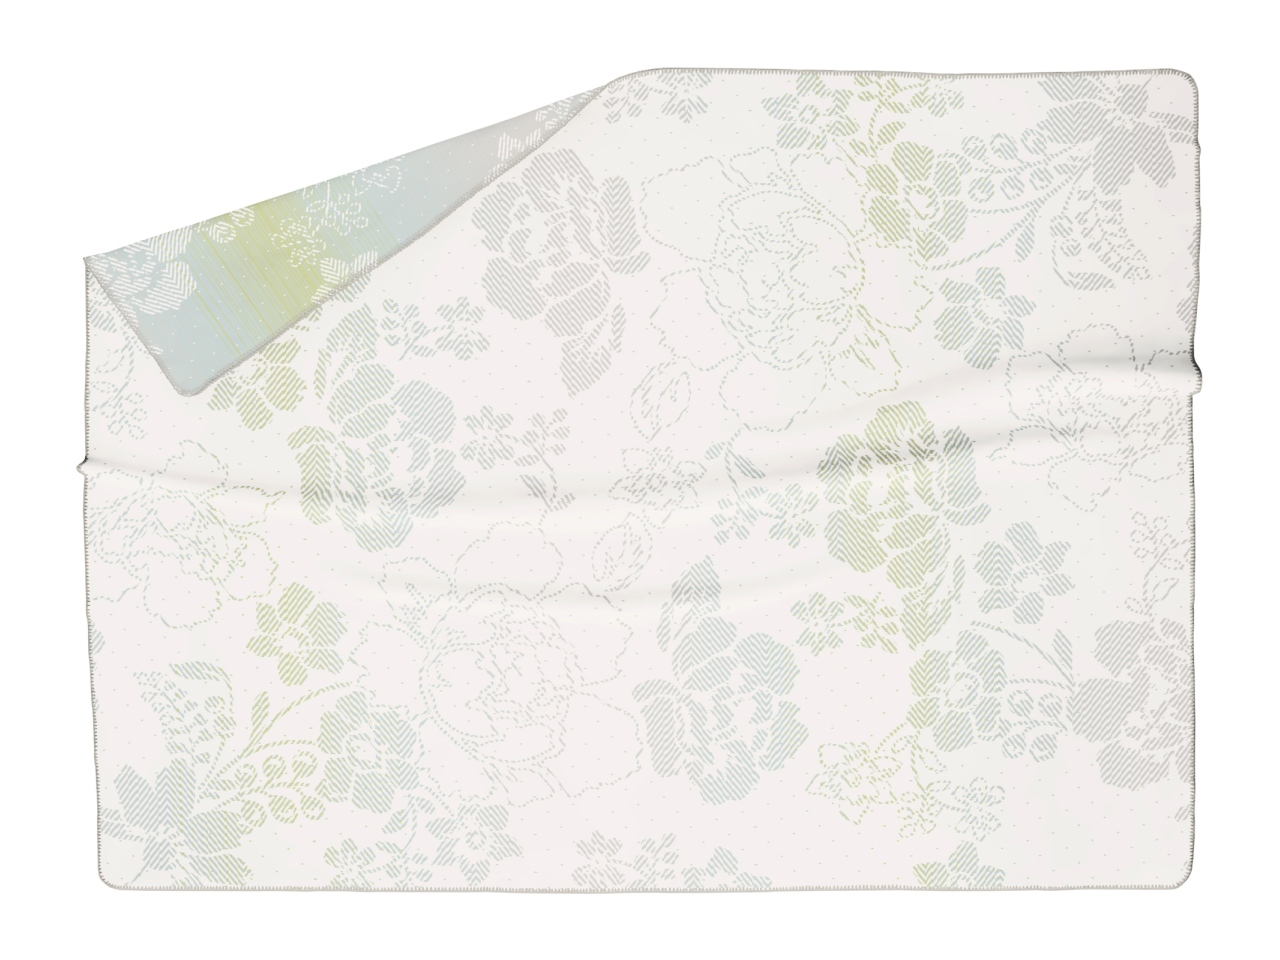 DEKA FLOWER BED 150x200 ORNAMENT picture